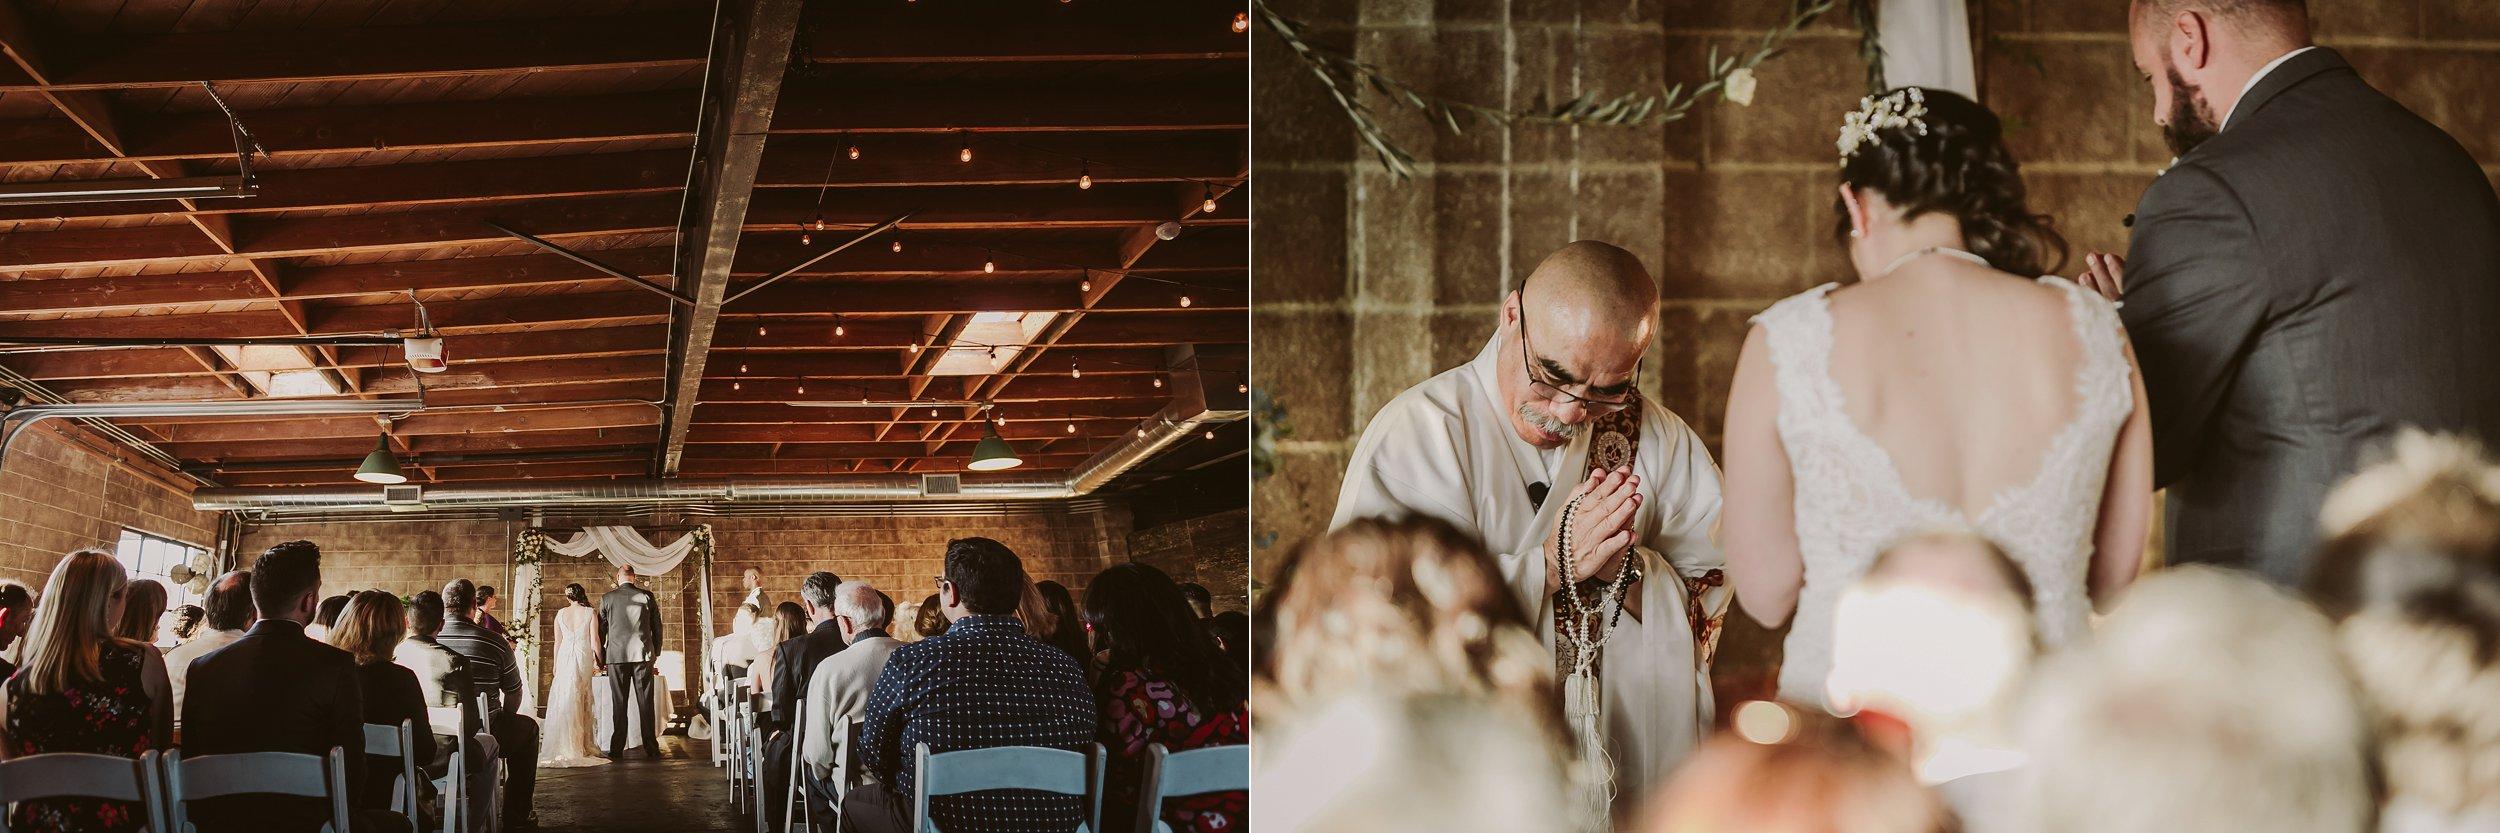 Smoky Hollw Studios Wedding_0020.jpg